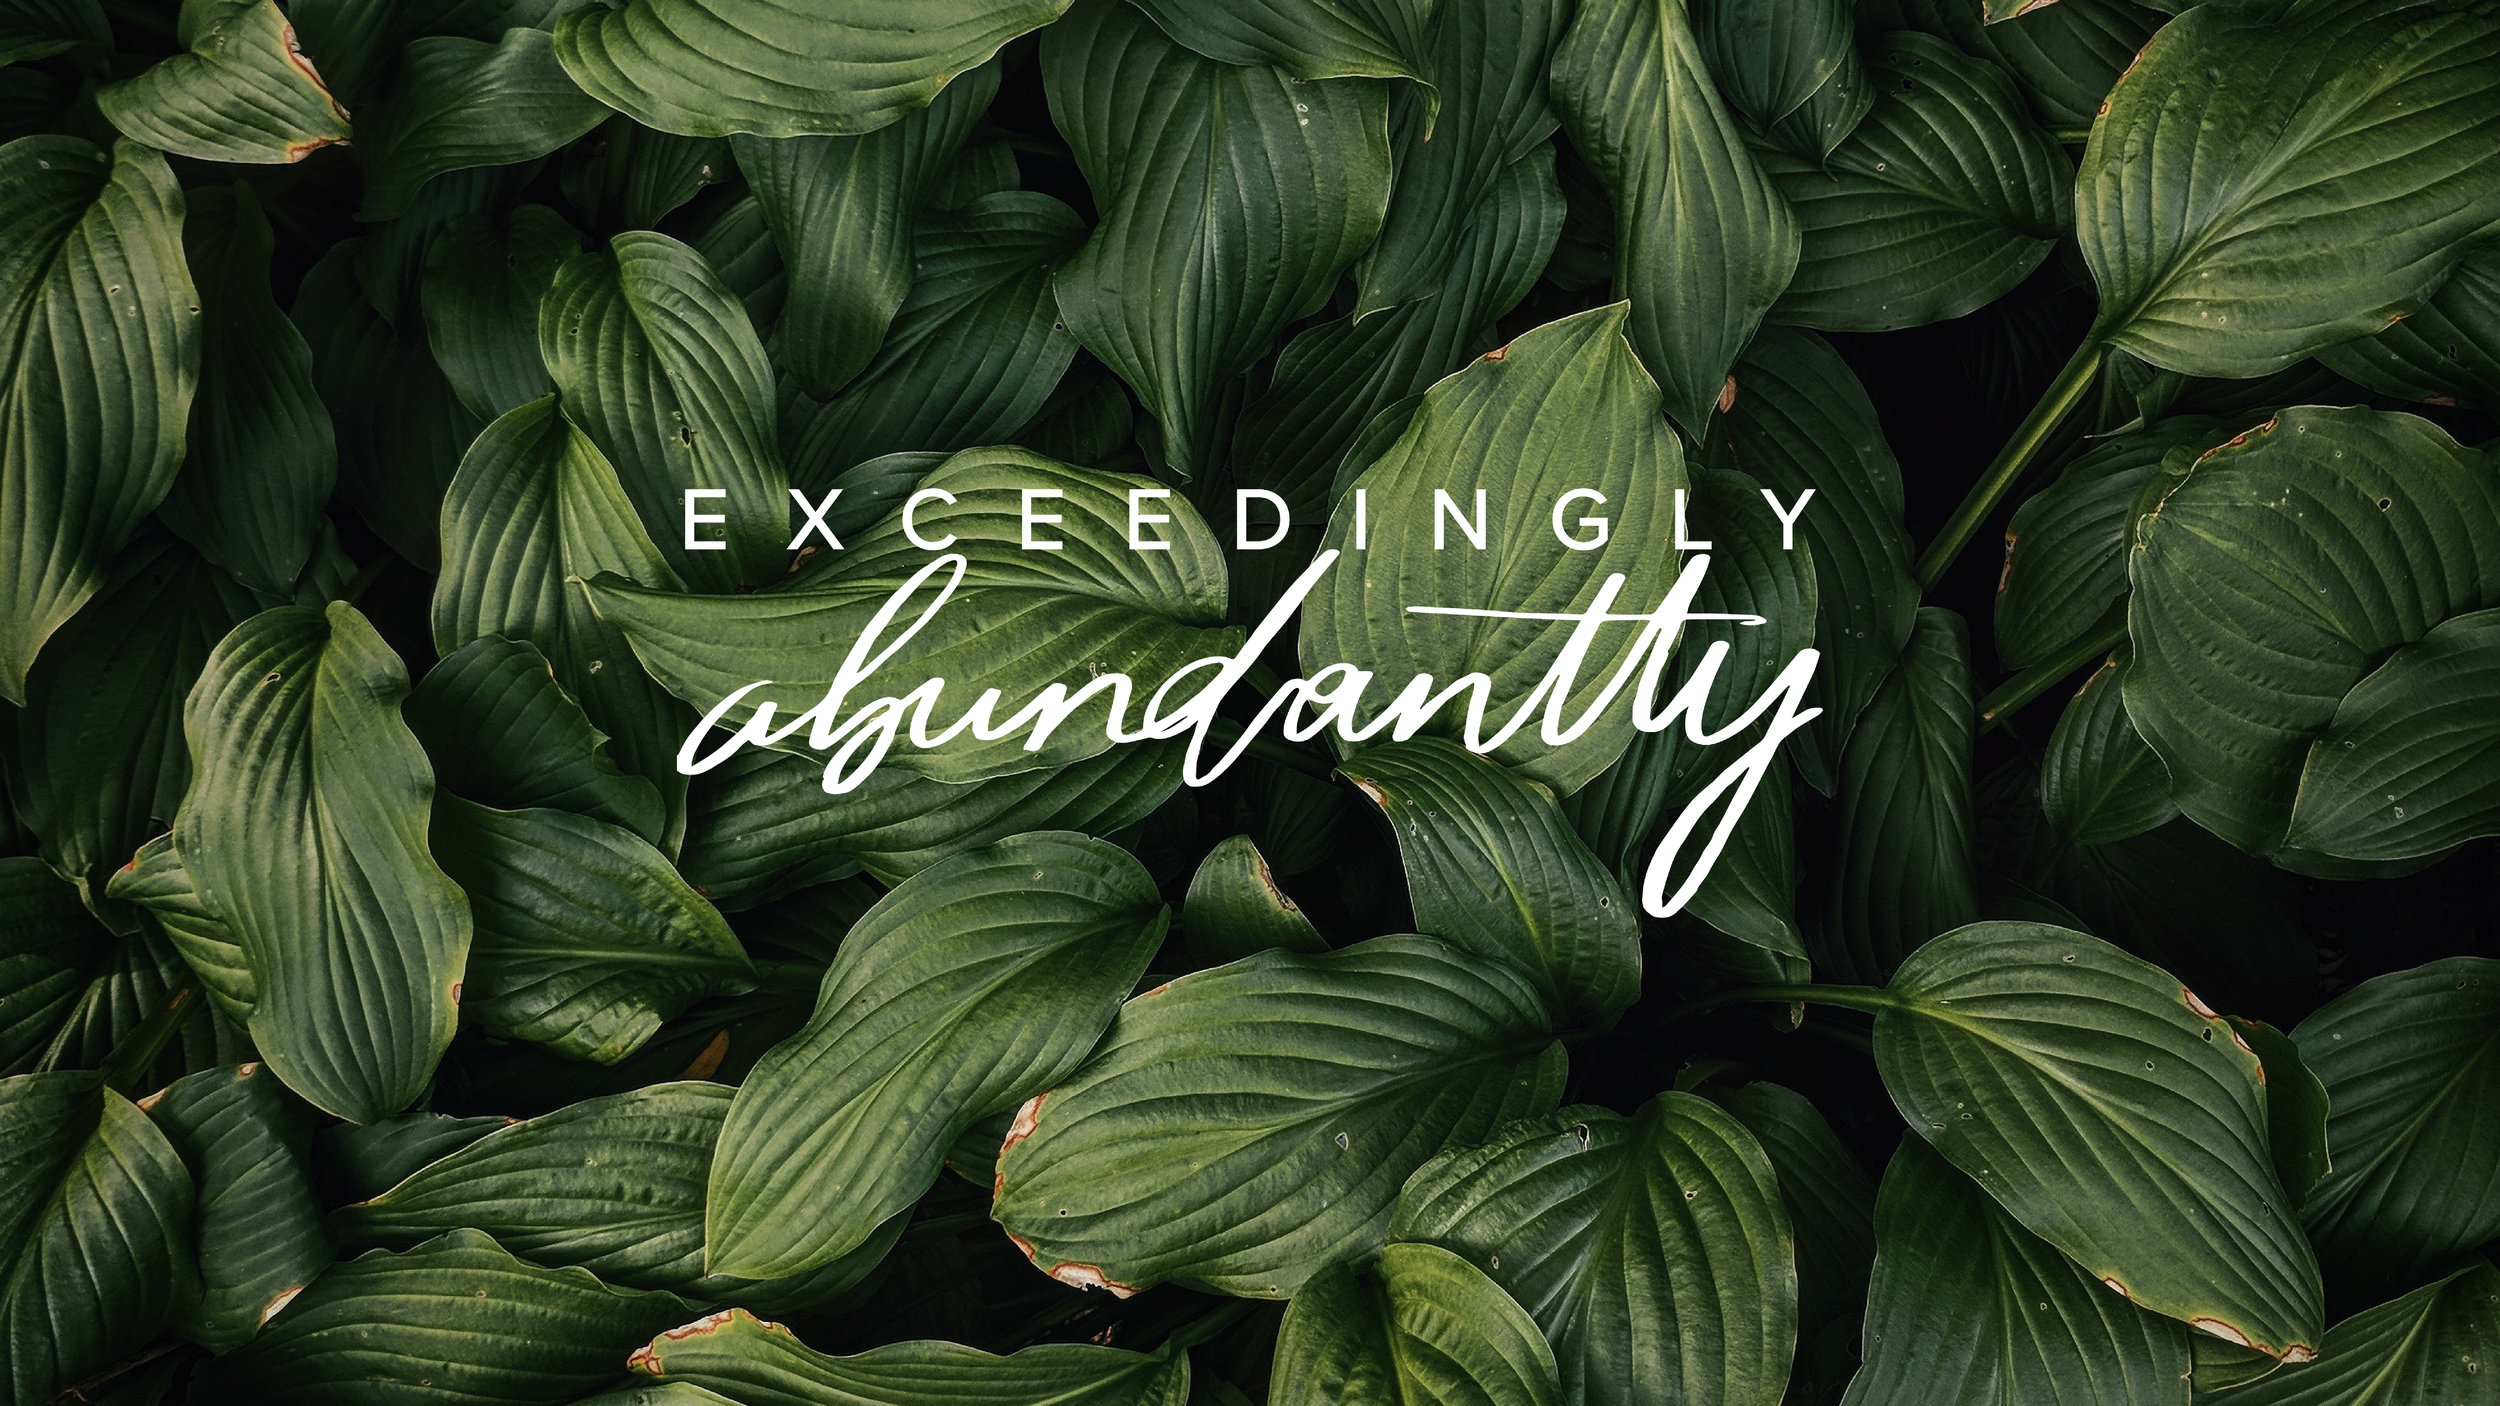 Exceedingly Abundantly / Branding Design